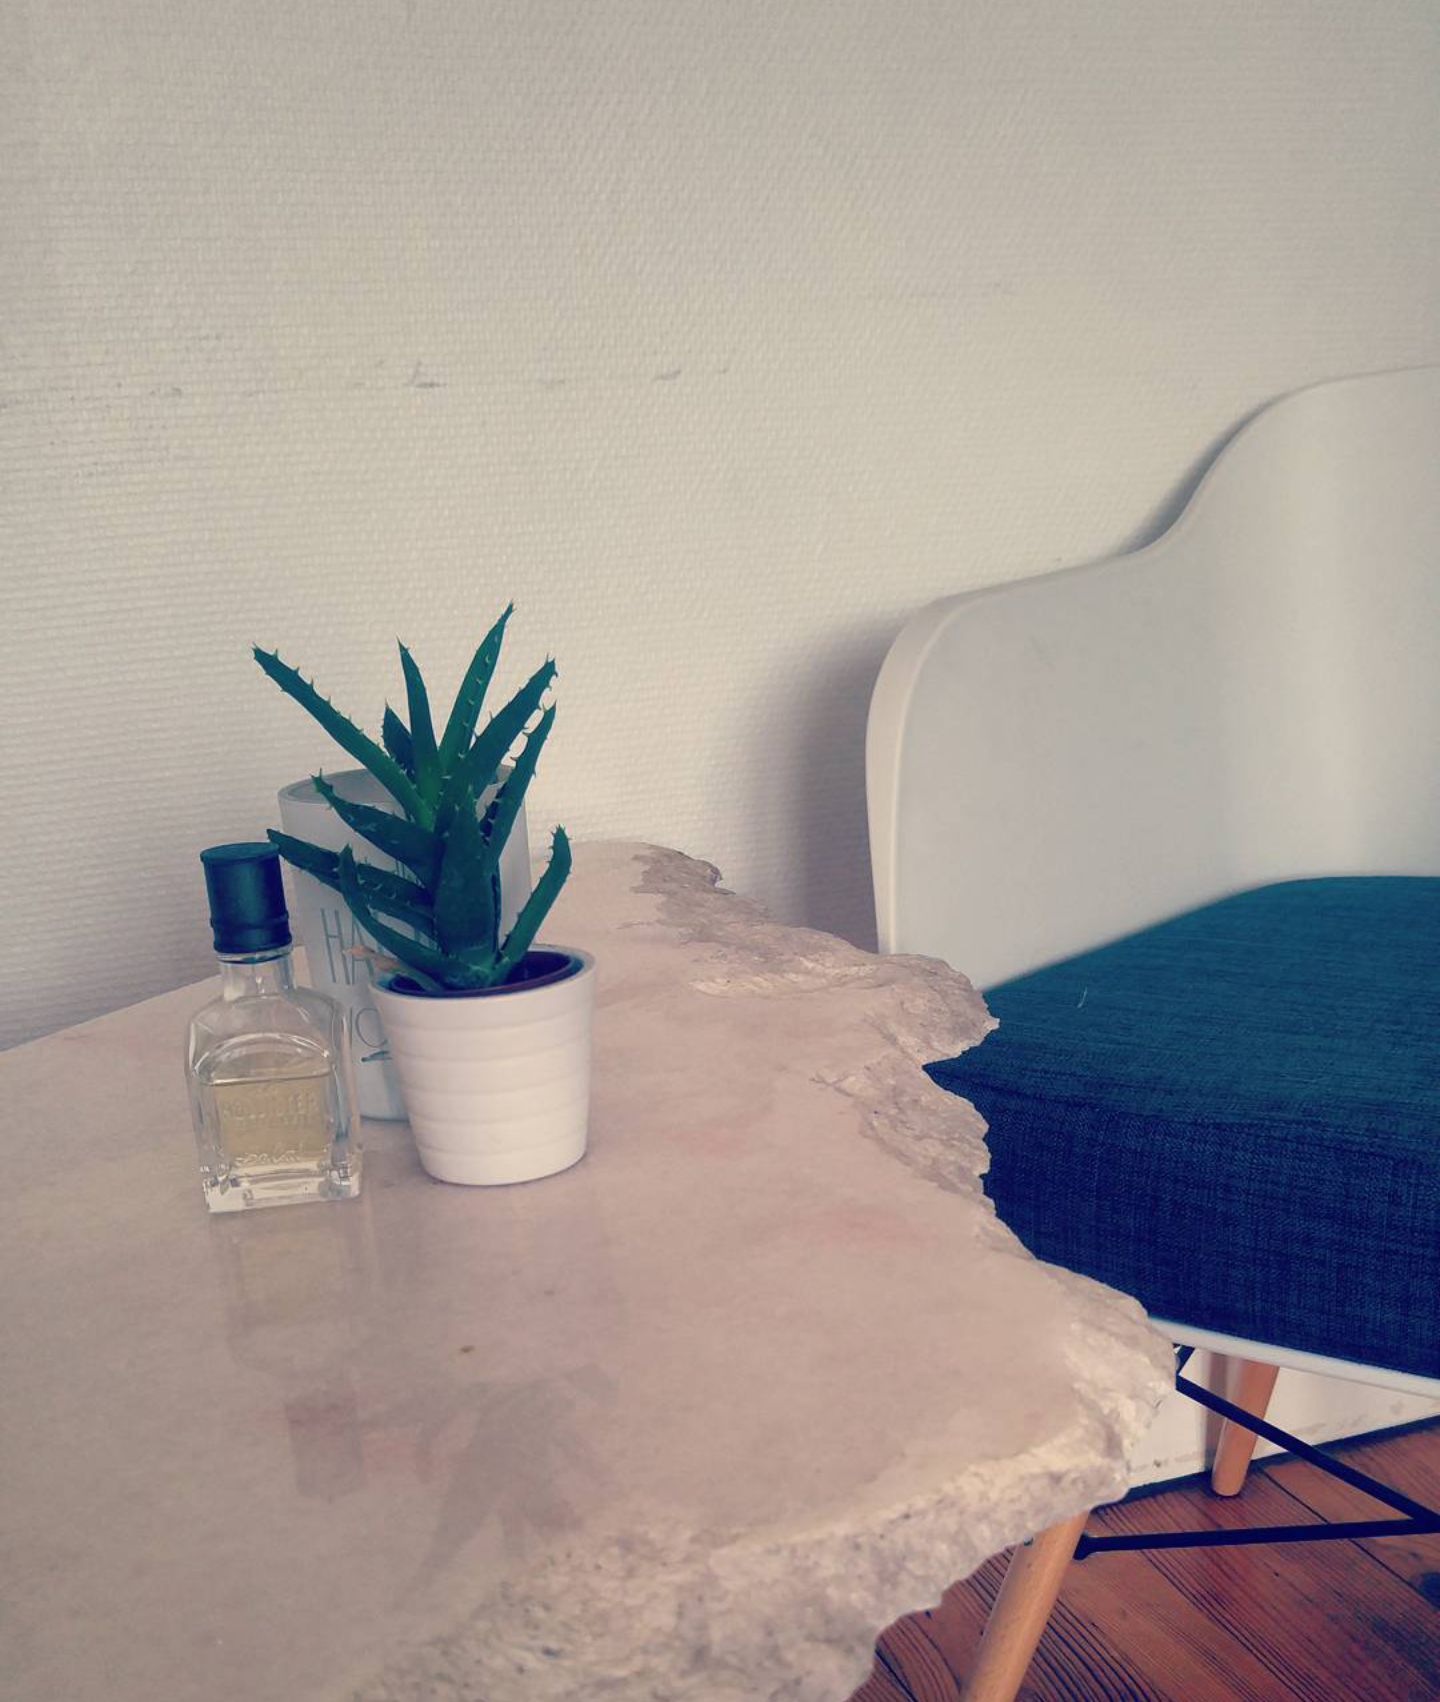 les tables en marbre de laur ne watine emmanuelle morice. Black Bedroom Furniture Sets. Home Design Ideas